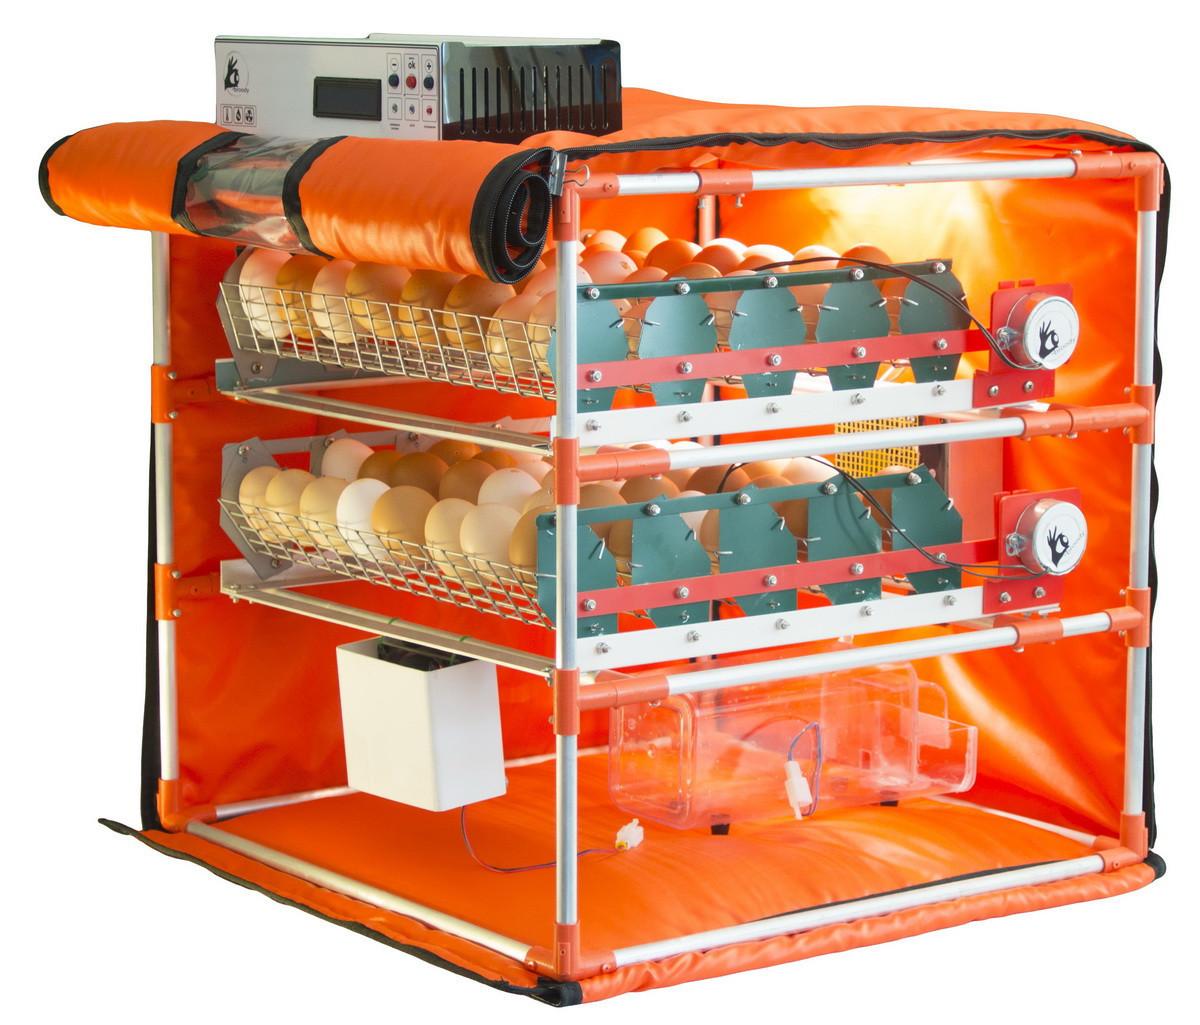 Автоматический инкубатор-конструктор (220V) на 90 яиц, с увлажнителем - фото 1